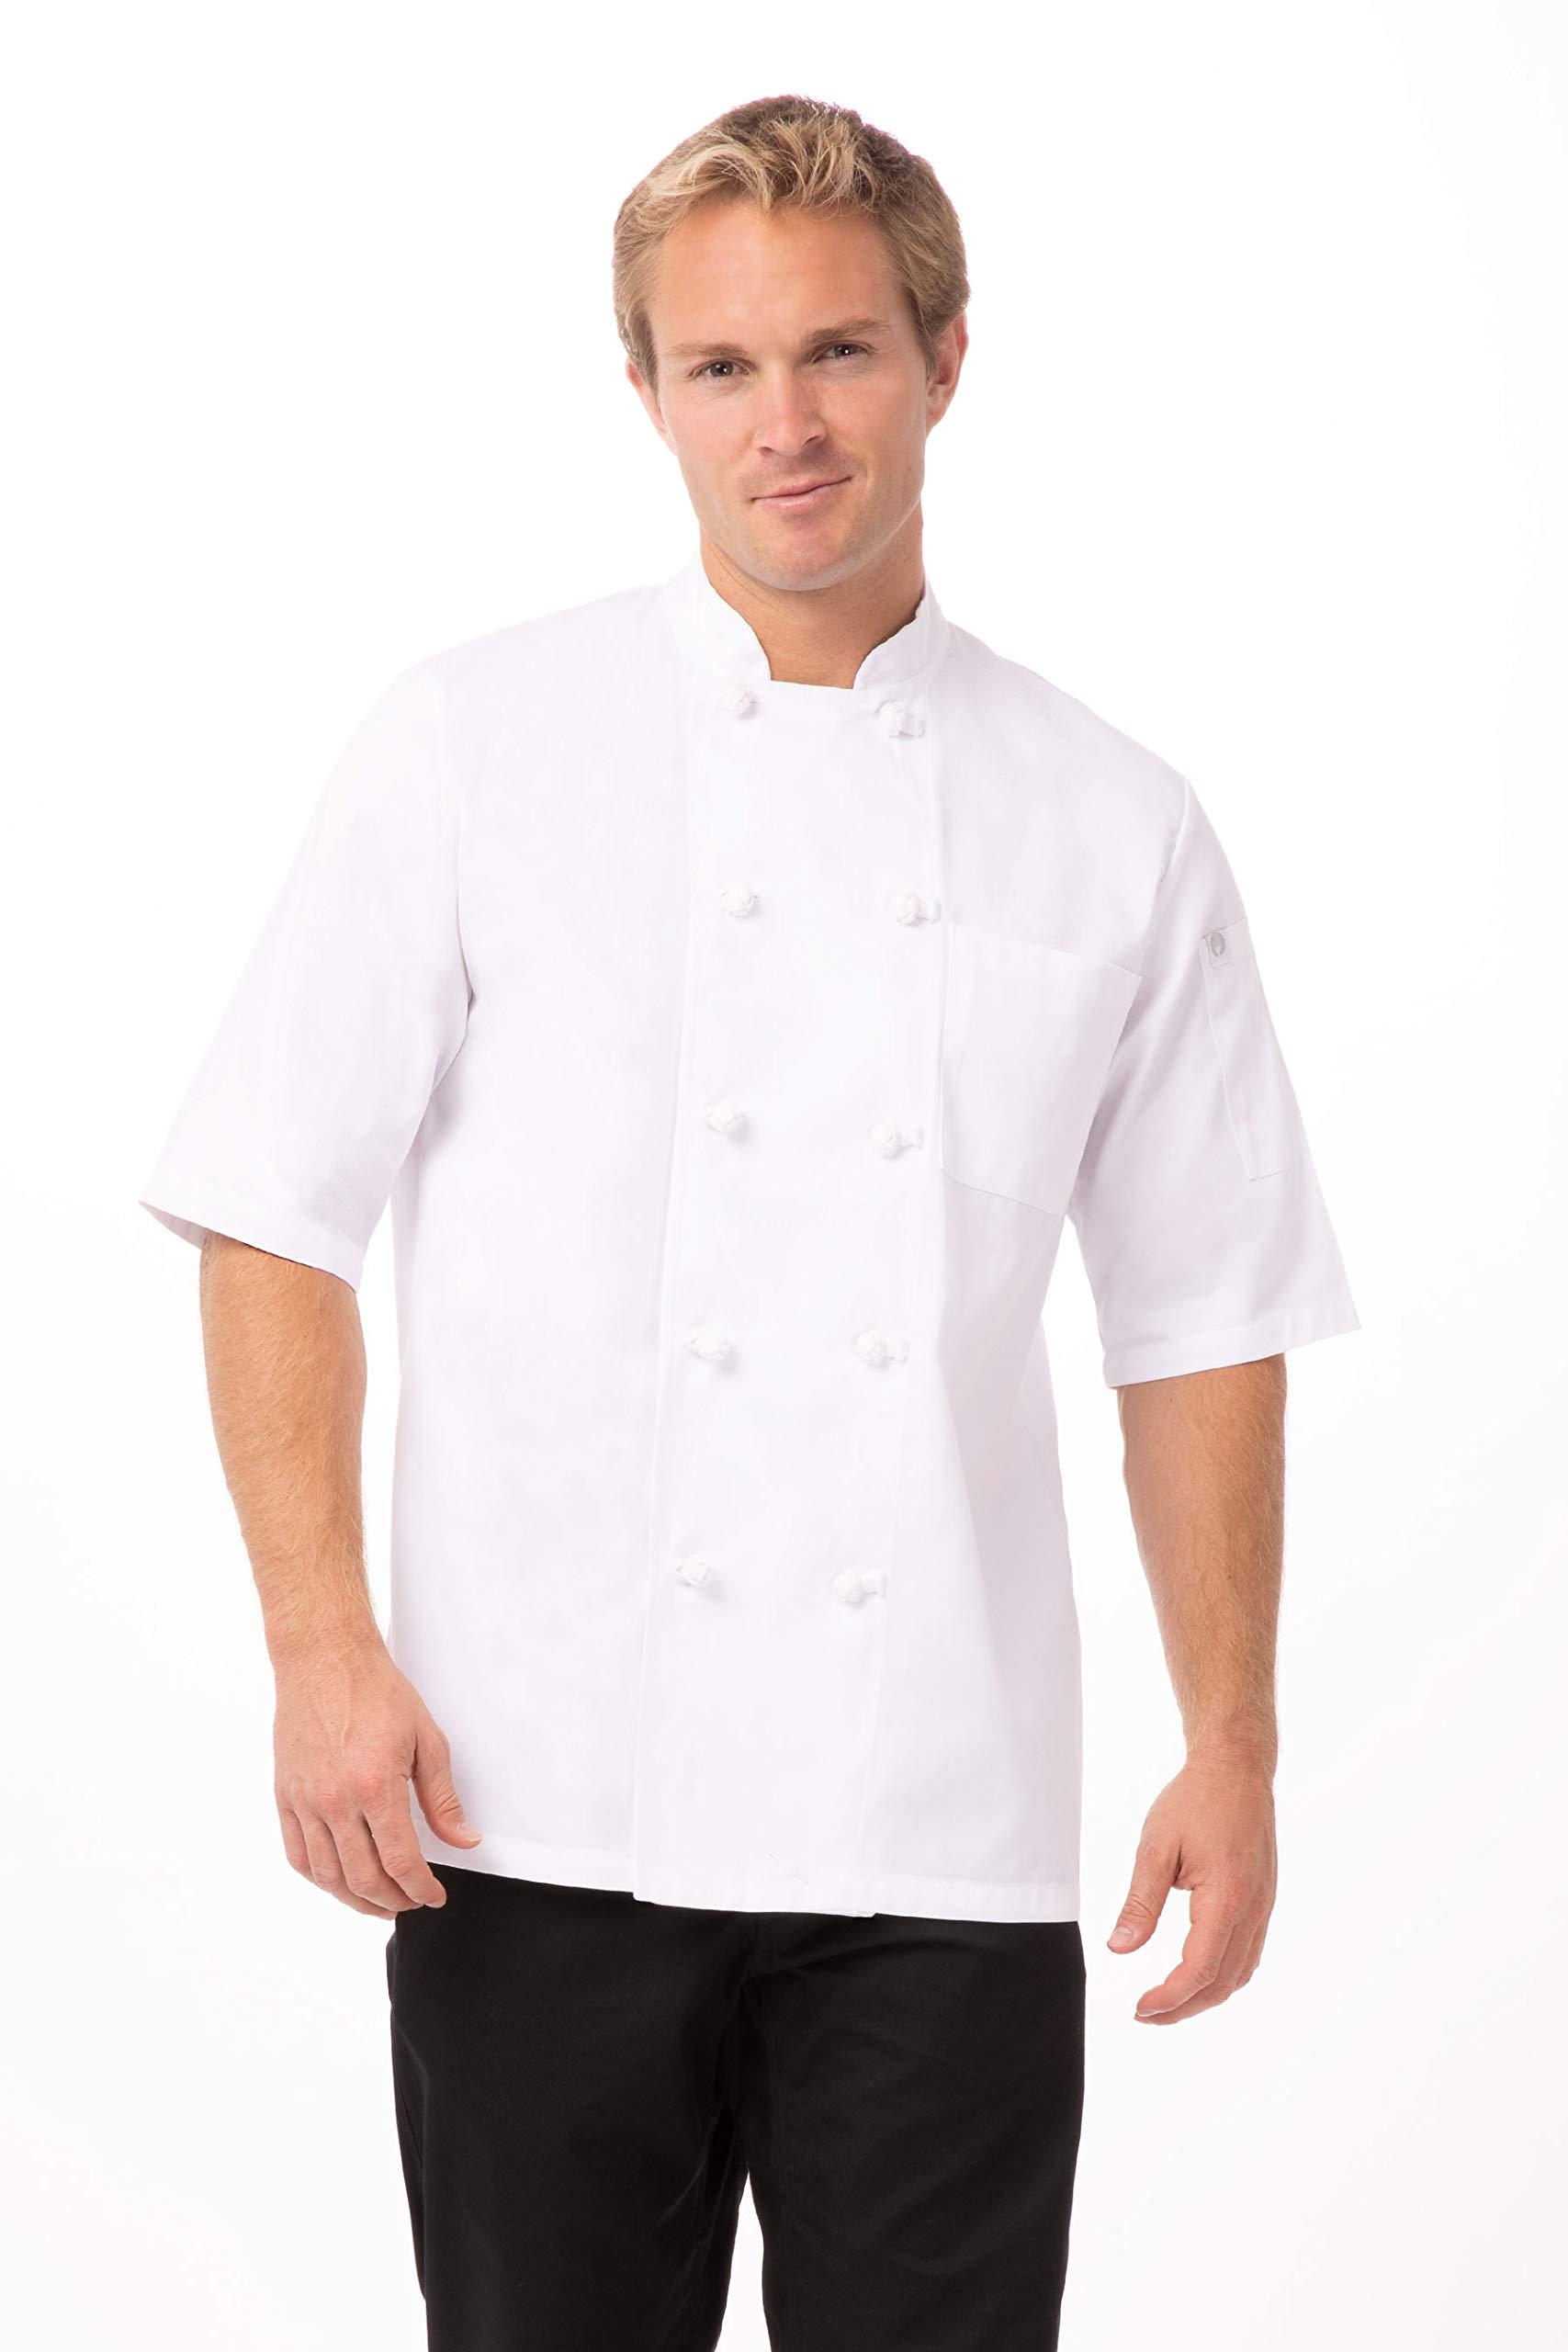 Chef Works Unisex Tivoli Chef Coat, White, 3X-Large by Chef Works